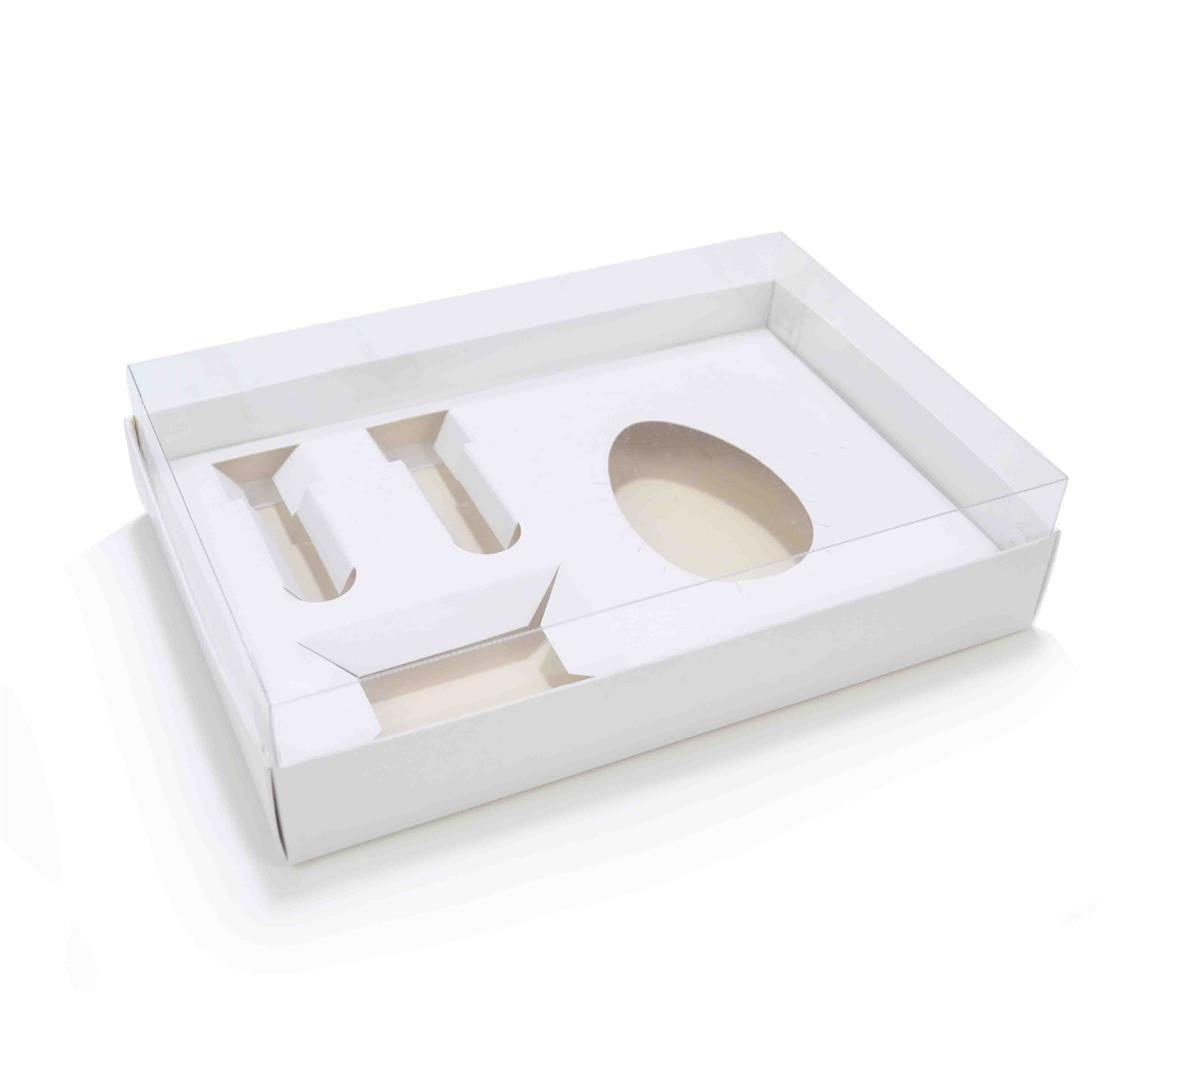 Ref 078 Branca - Caixa Kit Mini Confeiteiro Ovo 150 ou 250 gramas - 25x17x5,2 cm - c/ 10 unidades